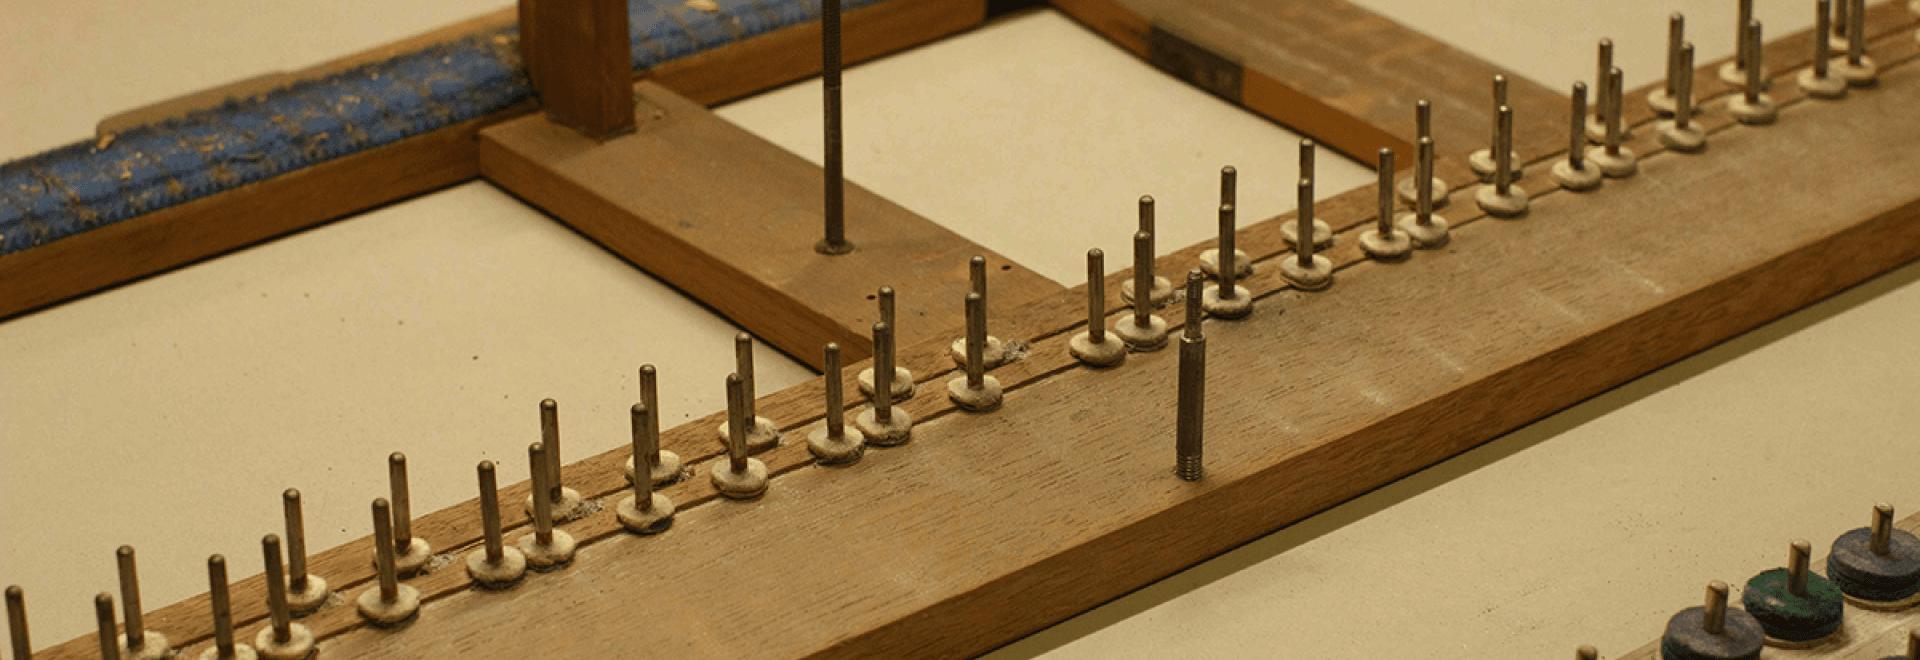 Restoration of Peter Benoit's Pleyel piano